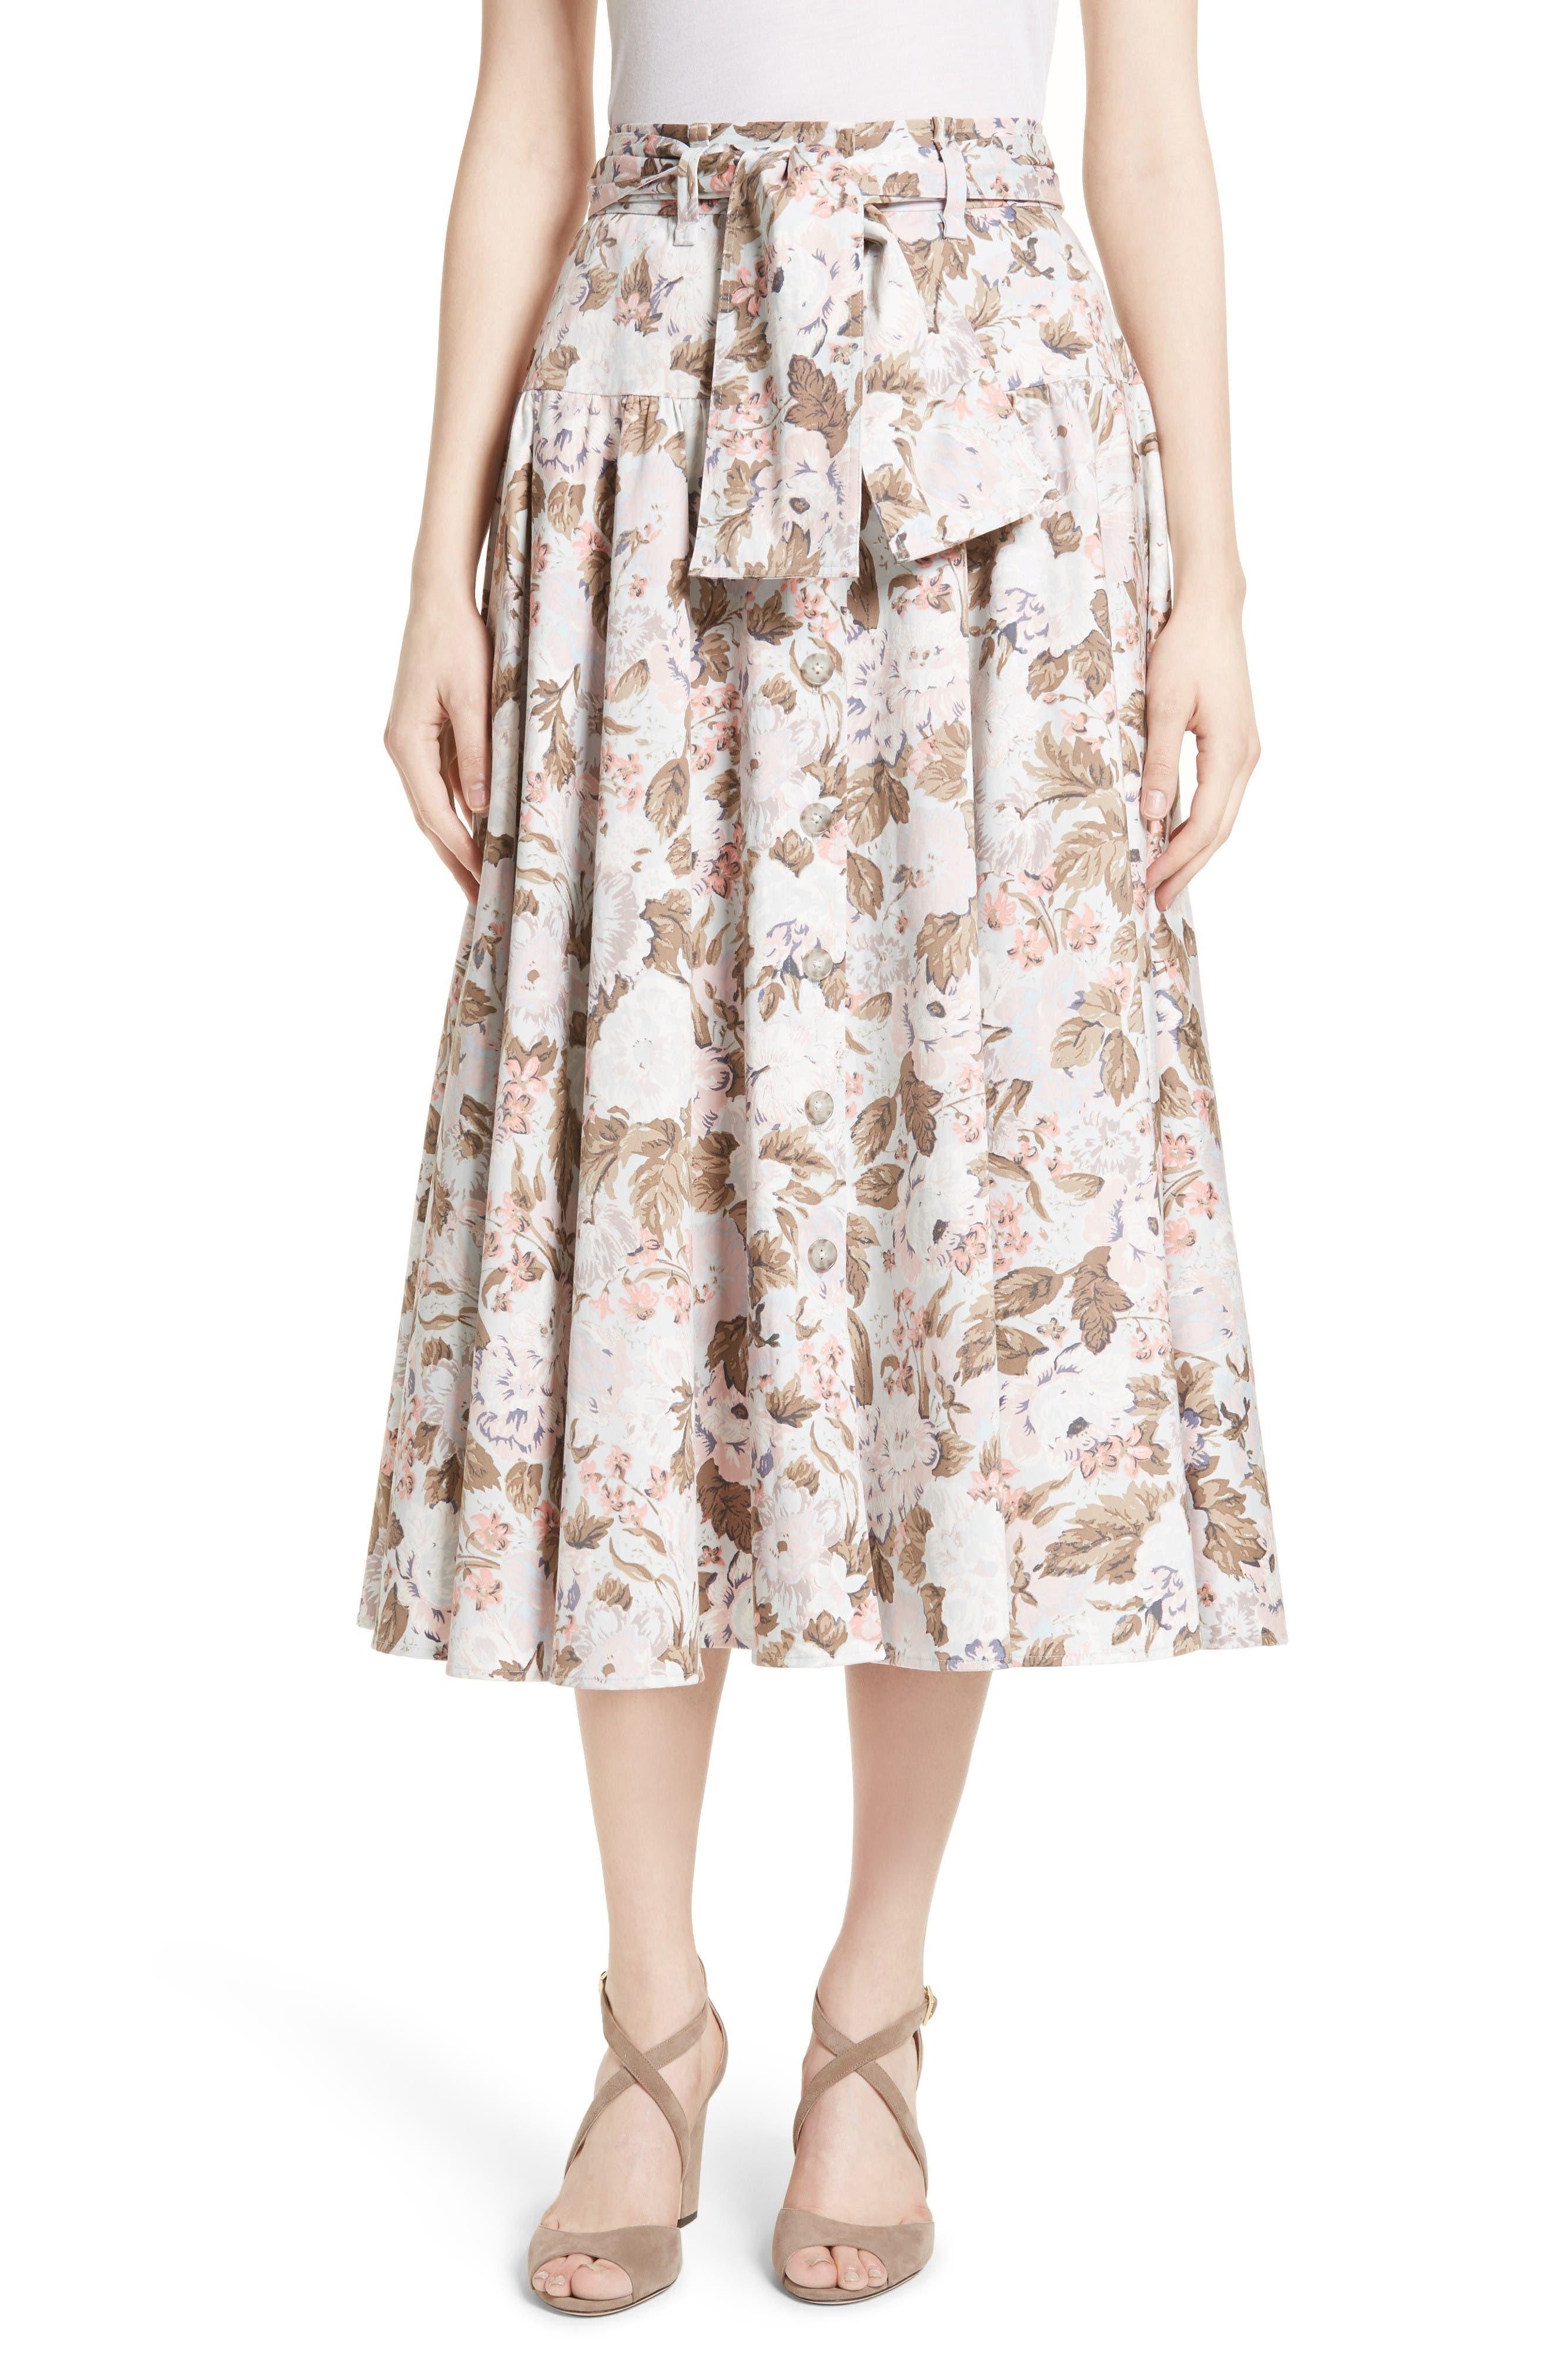 Rebecca Taylor Penelope Floral Midi Skirt